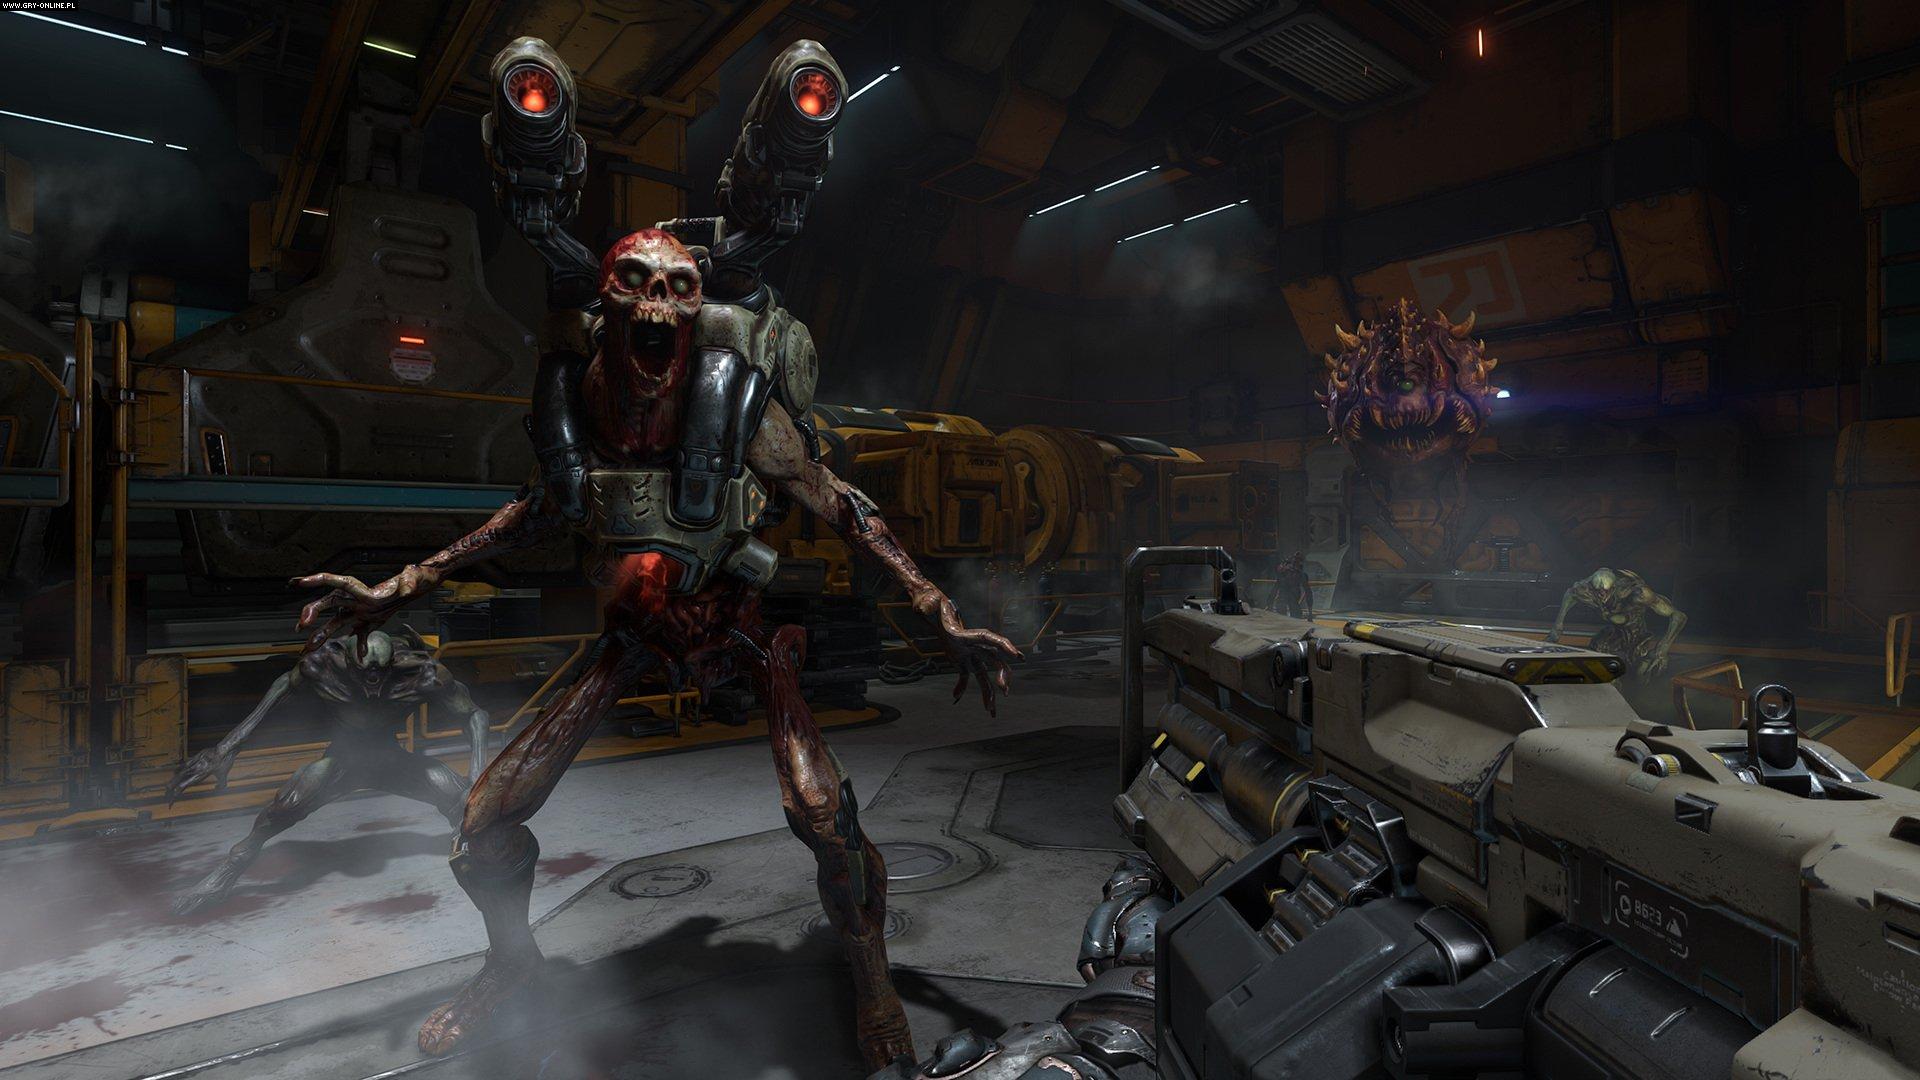 Doom PC, PS4, XONE Games Image 6/39, id Software, Bethesda Softworks